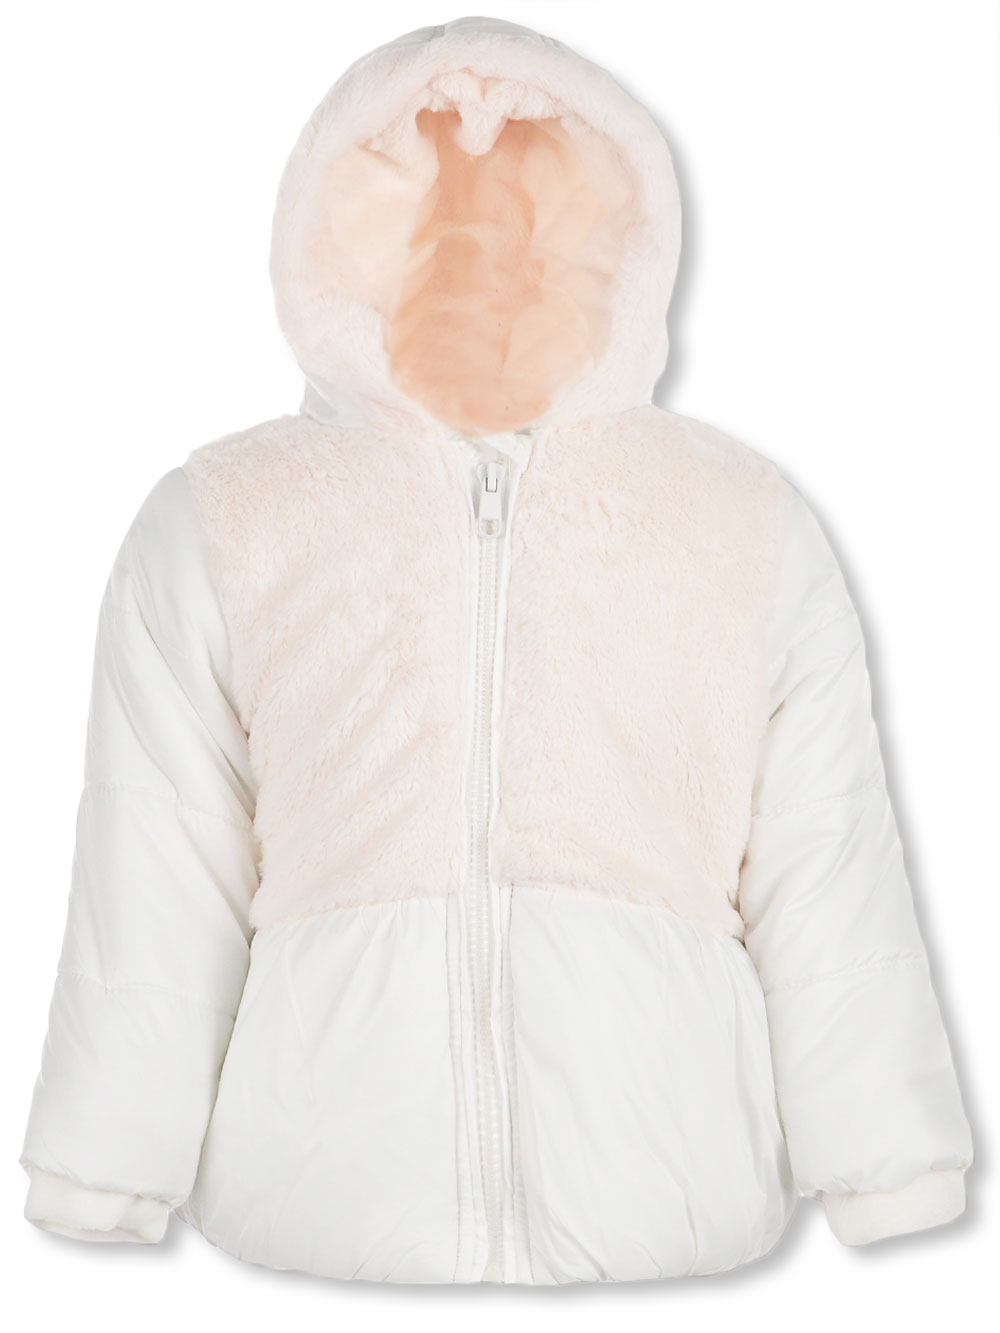 Reebok Baby Girls/' Hooded Pram Suit